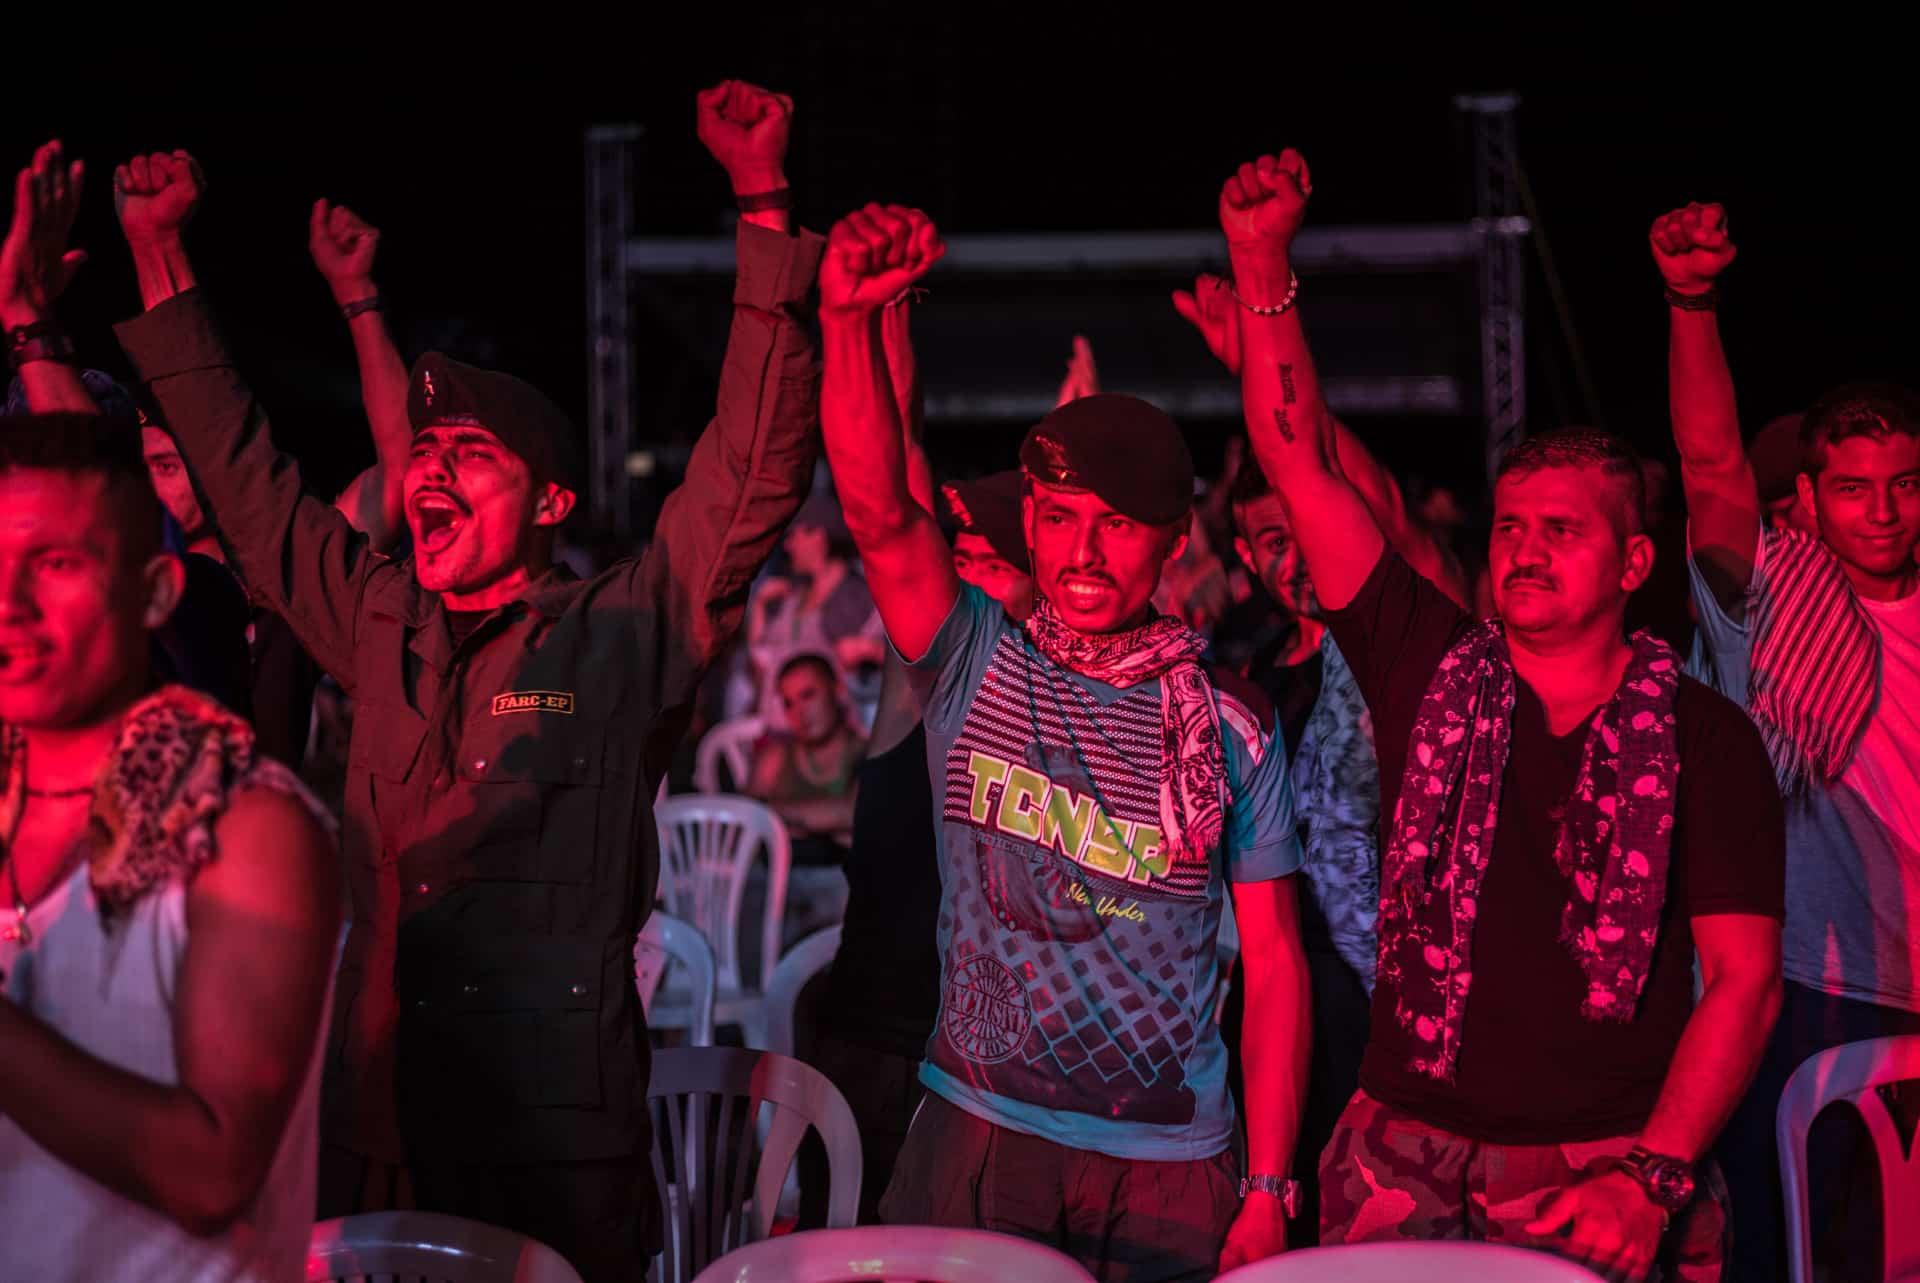 Arredondo_Juan_Photojournalism_FARC_002